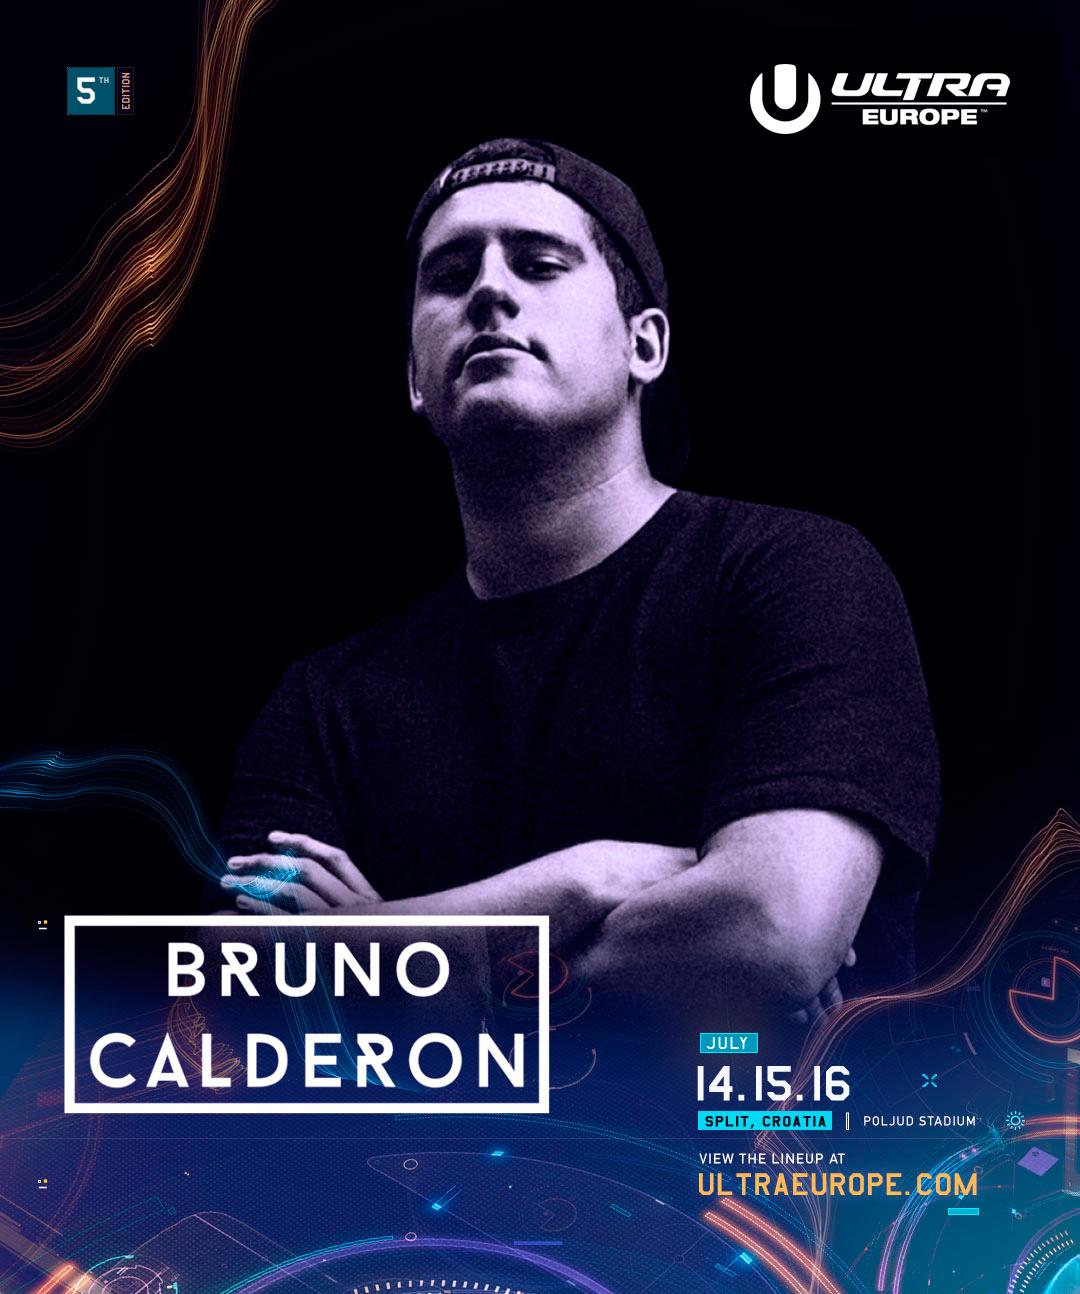 Bruno Calderon at Ultra Europe 2017